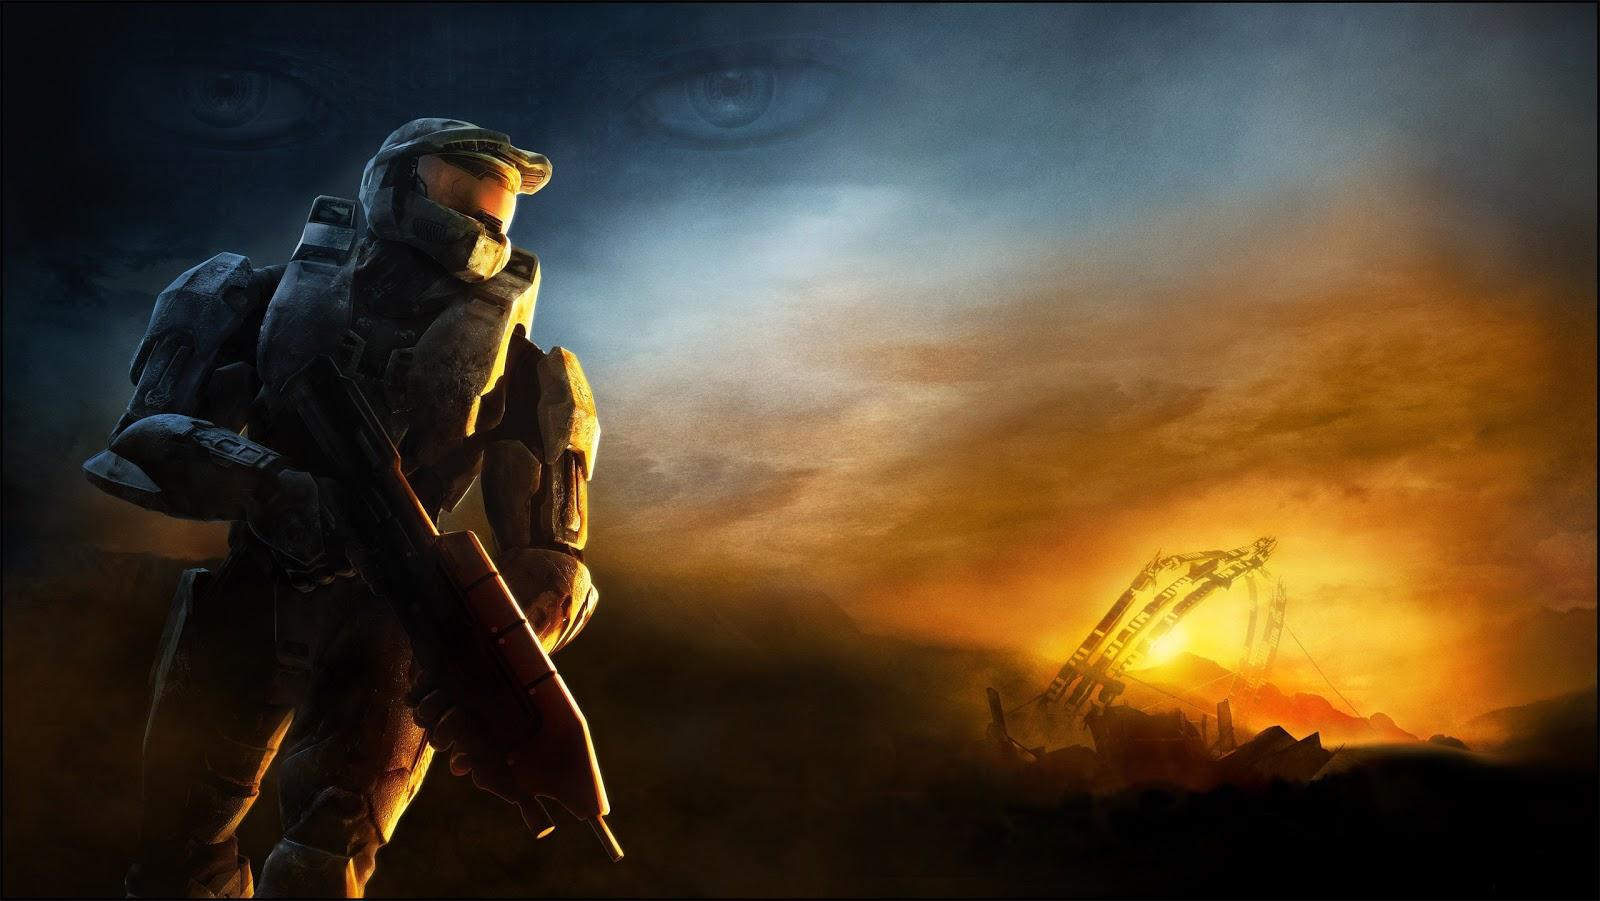 Halo Reach Wallpaper 1600x901